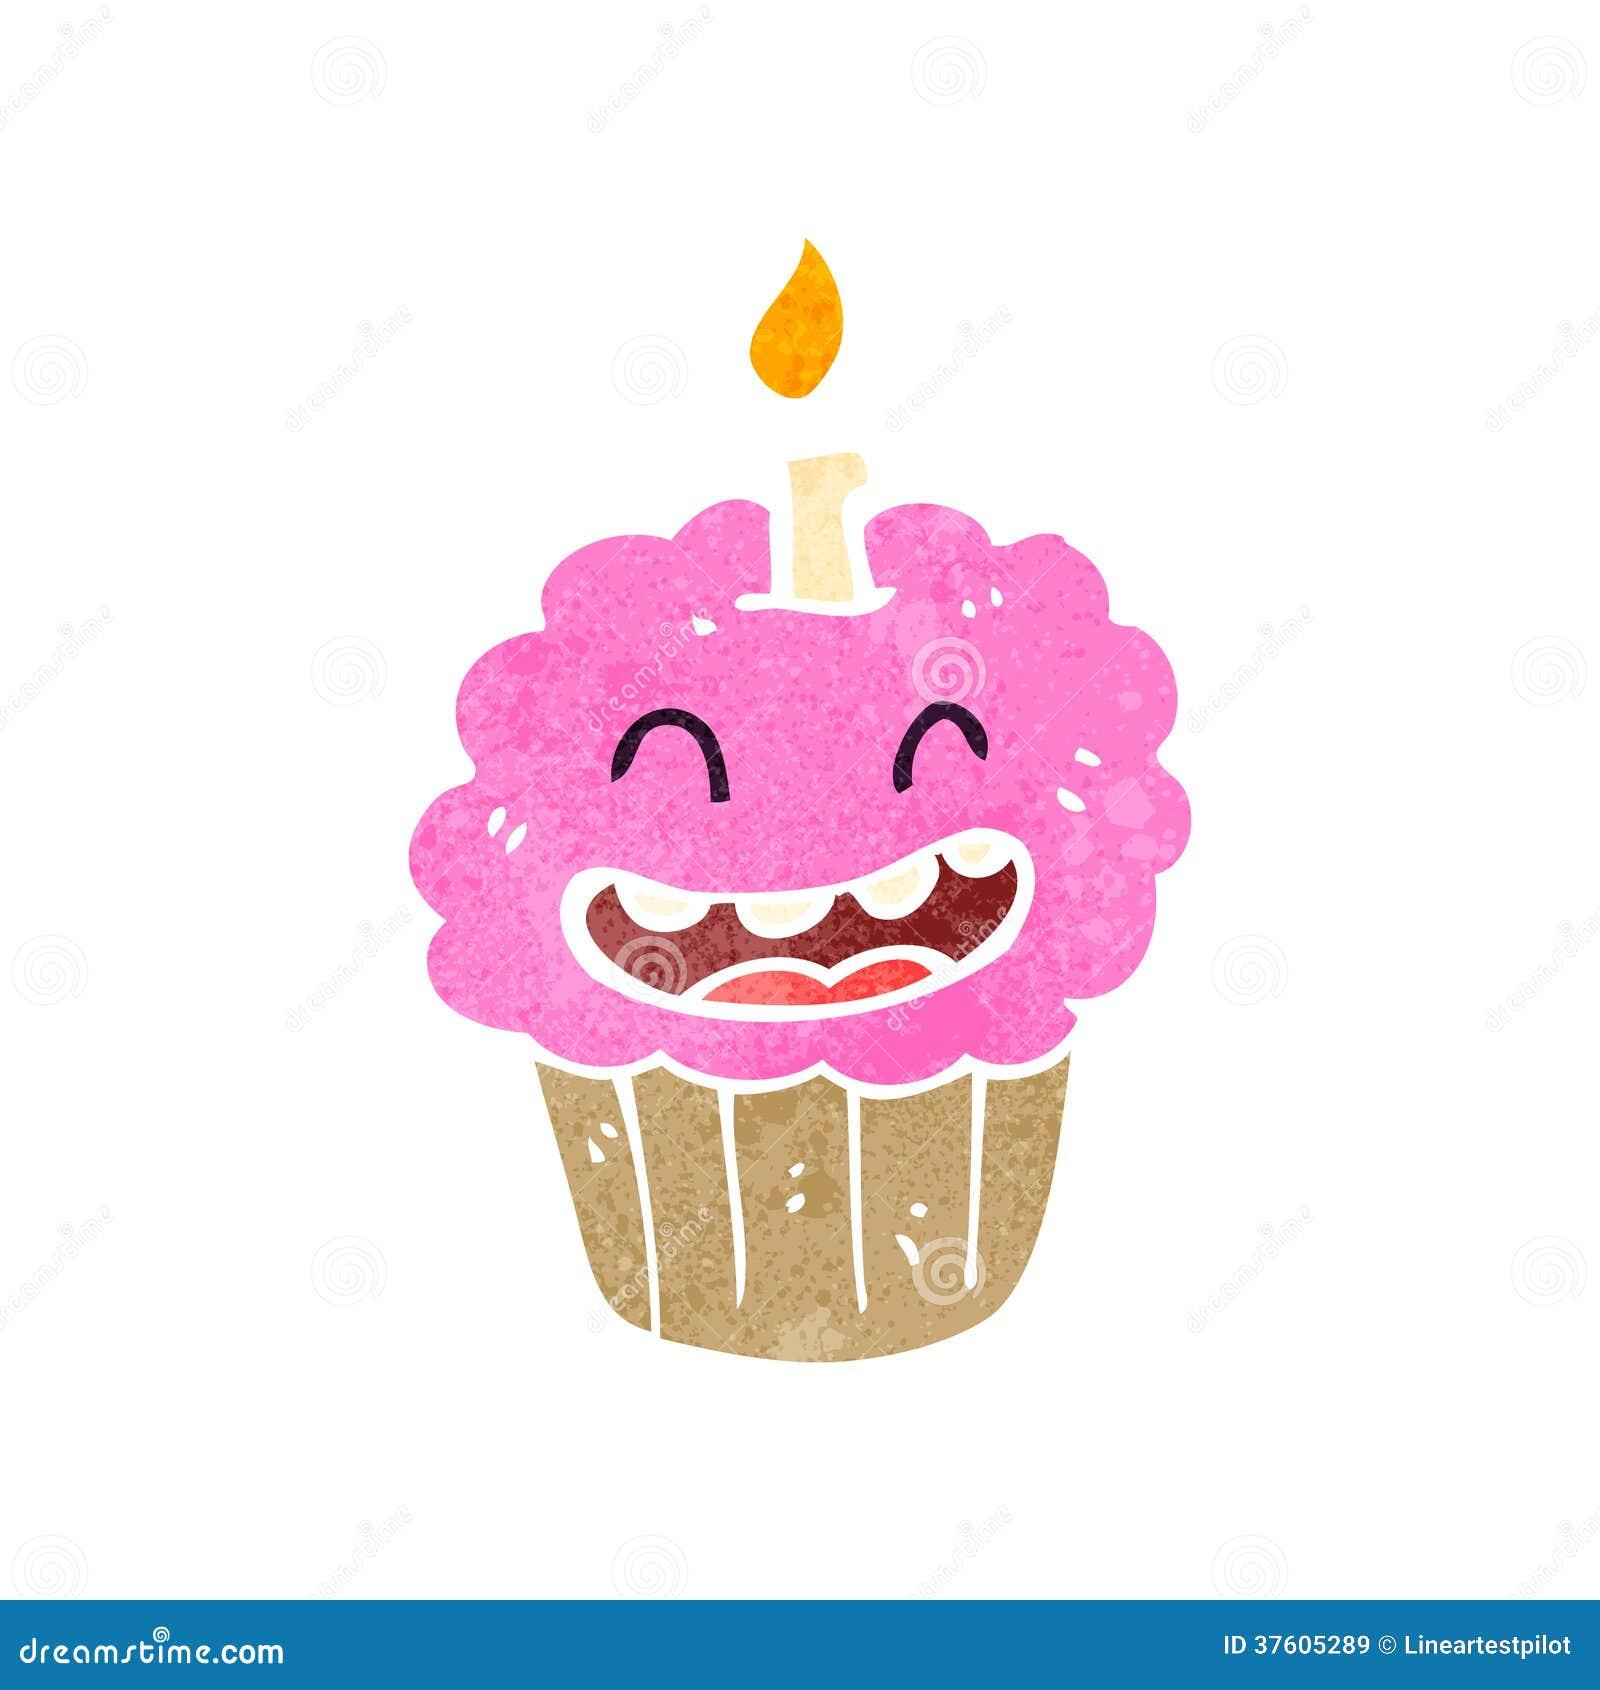 retro cartoon cupcake with face stock illustration illustration of